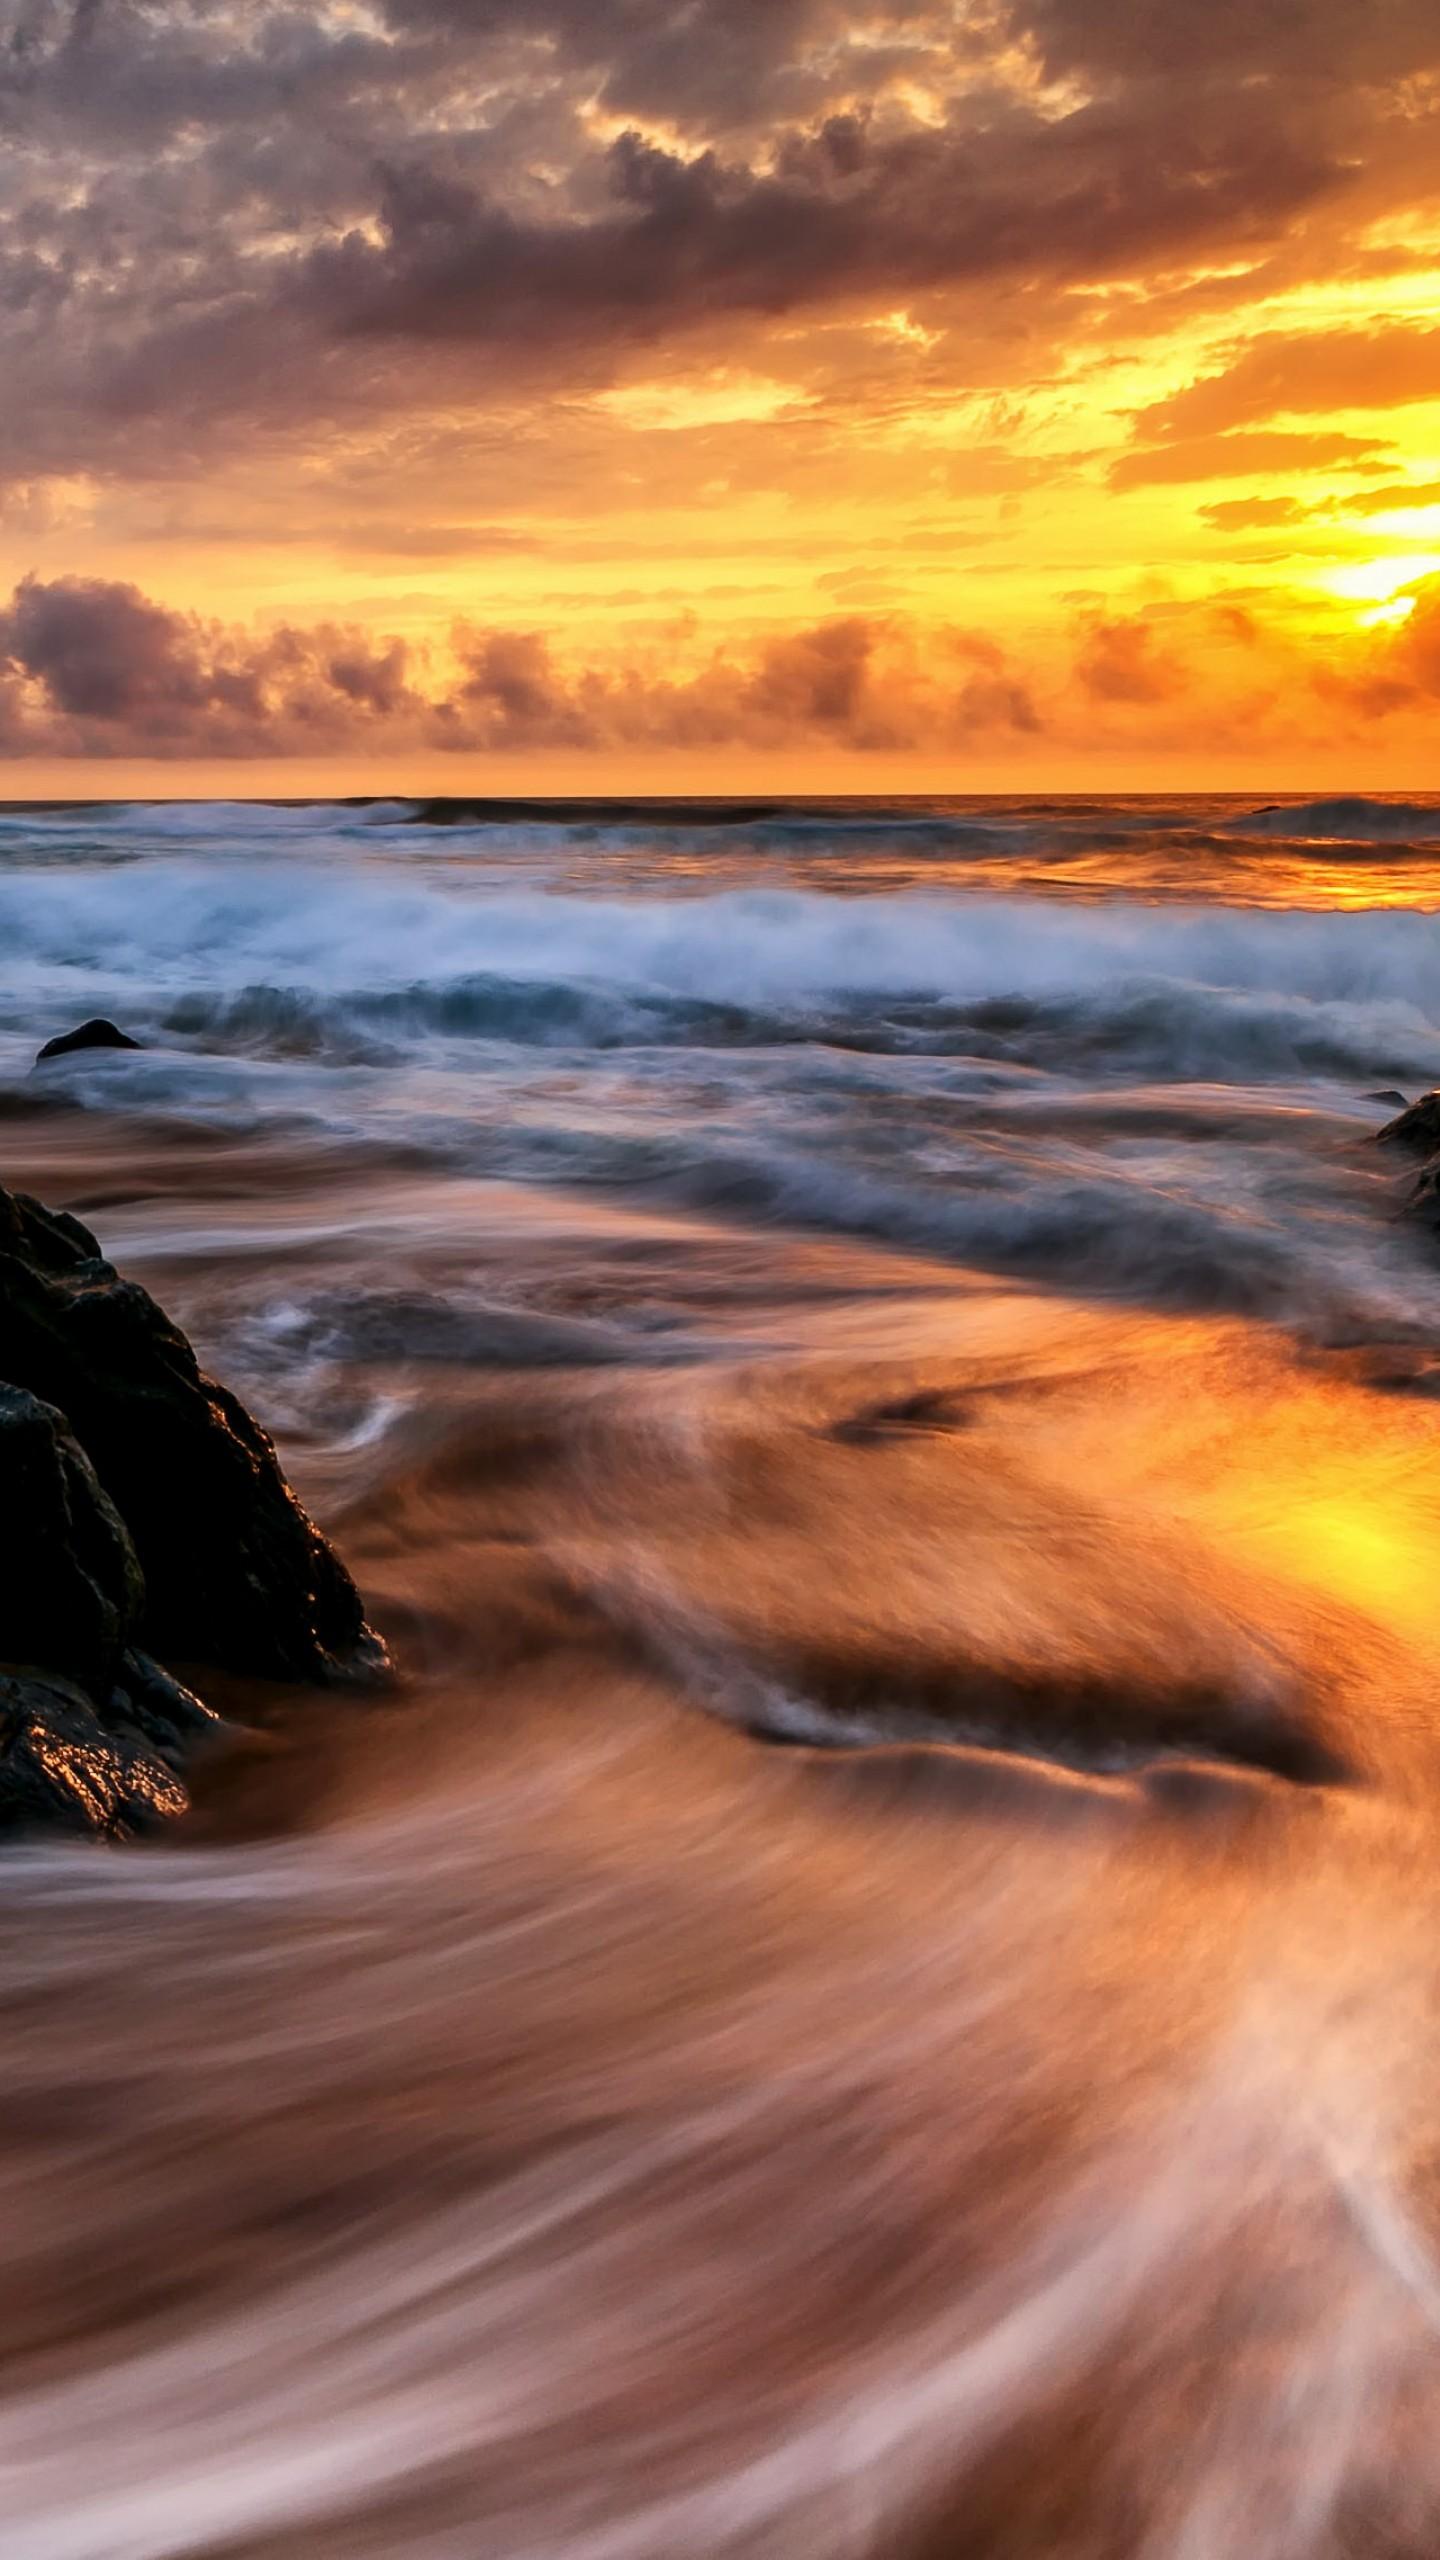 Wallpaper Sunrise, ocean, 4K, Nature #19545